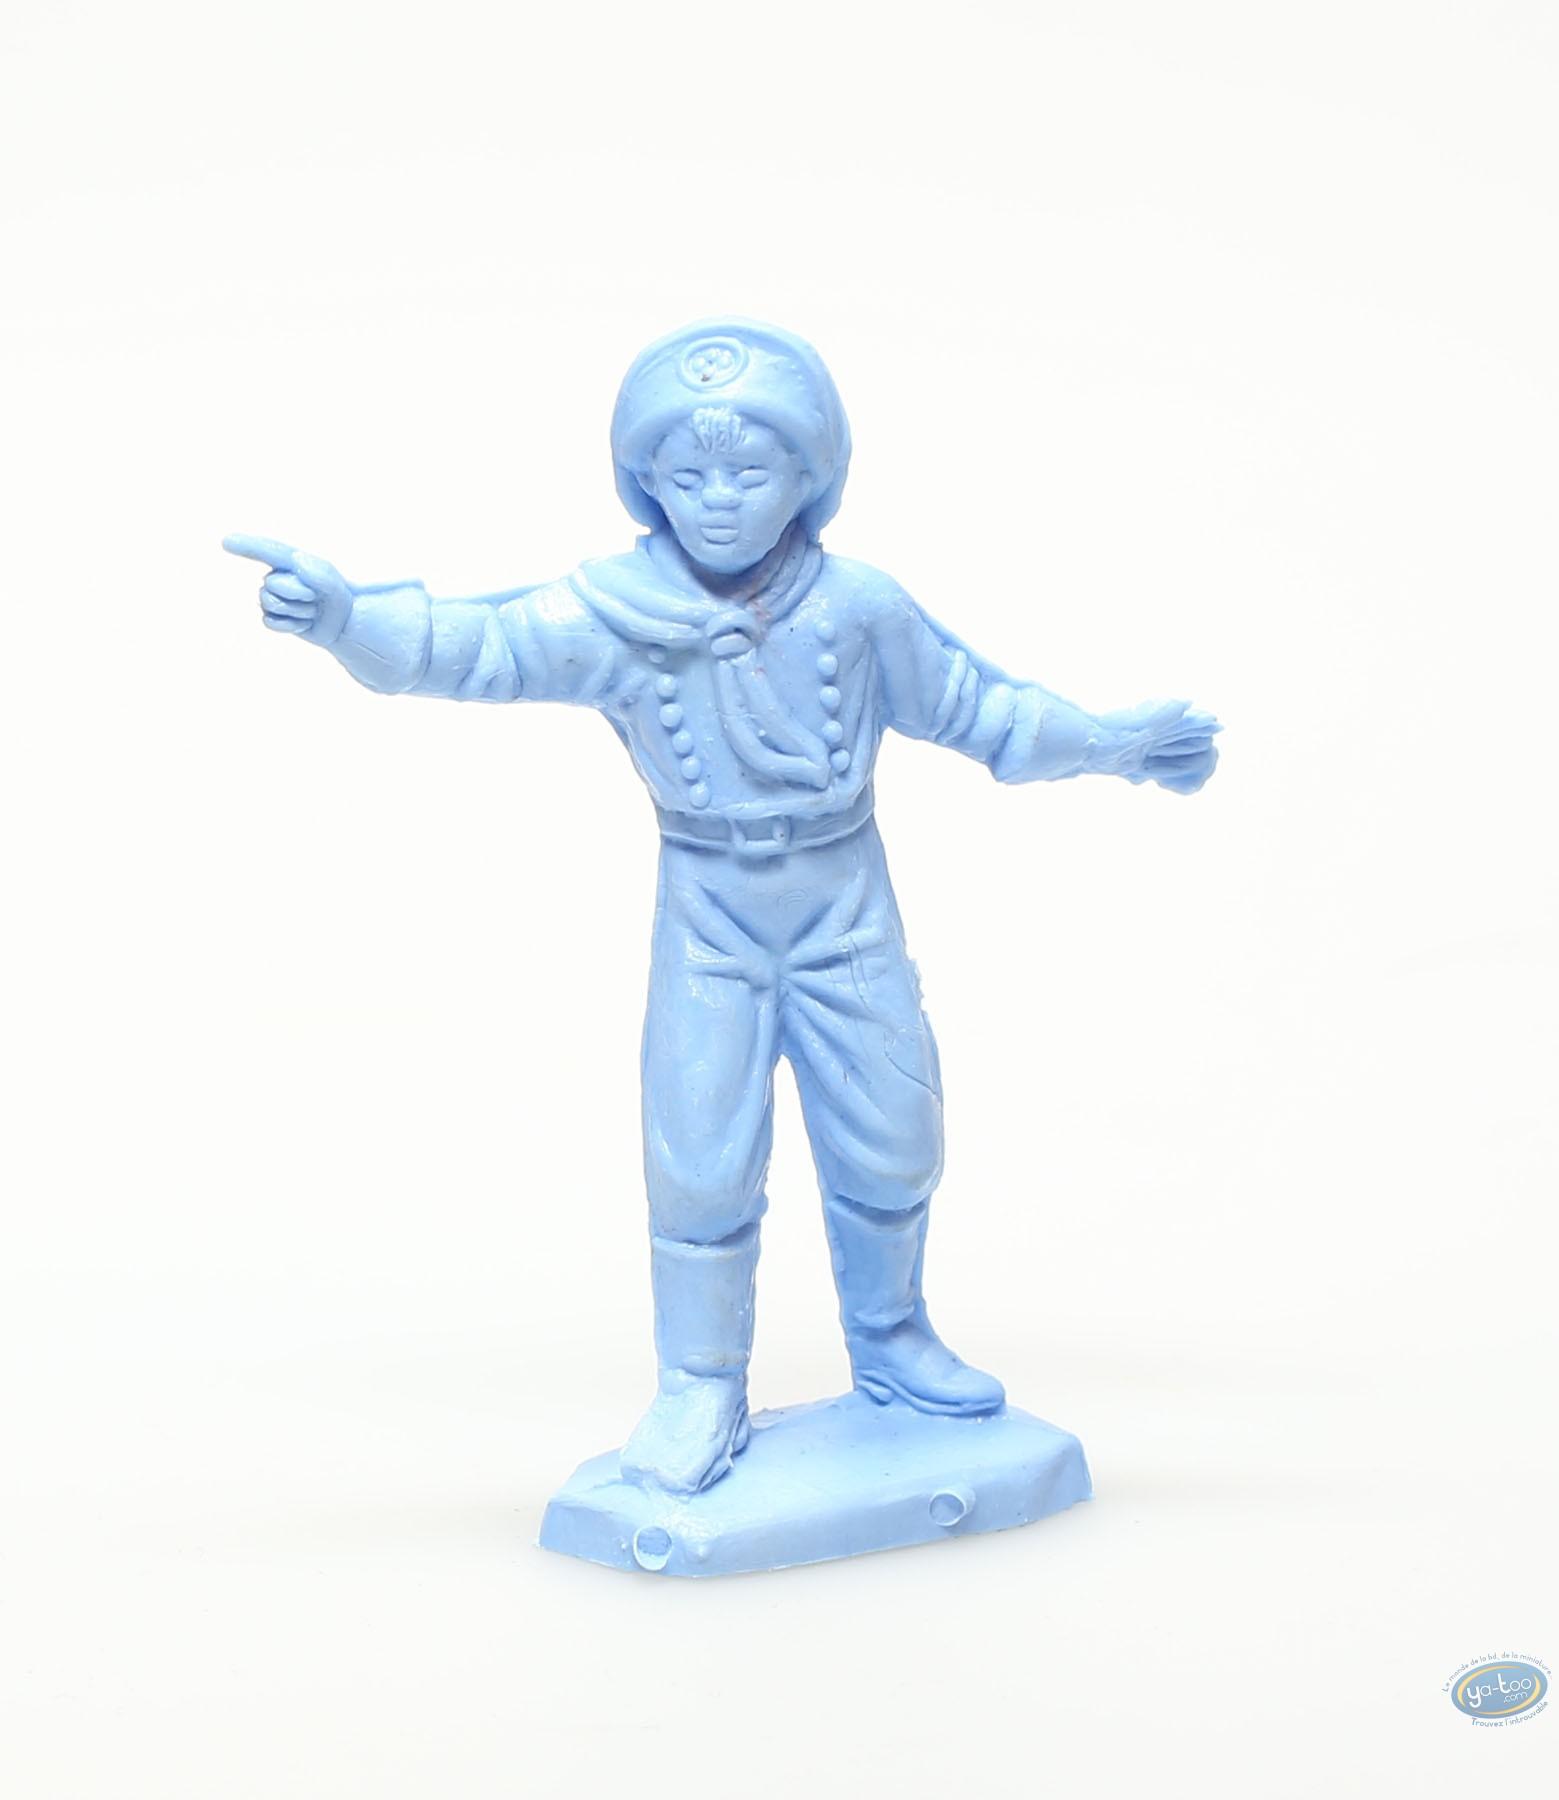 Plastic Figurine, Rintintin : Plastic figure : Young boy pointing blue